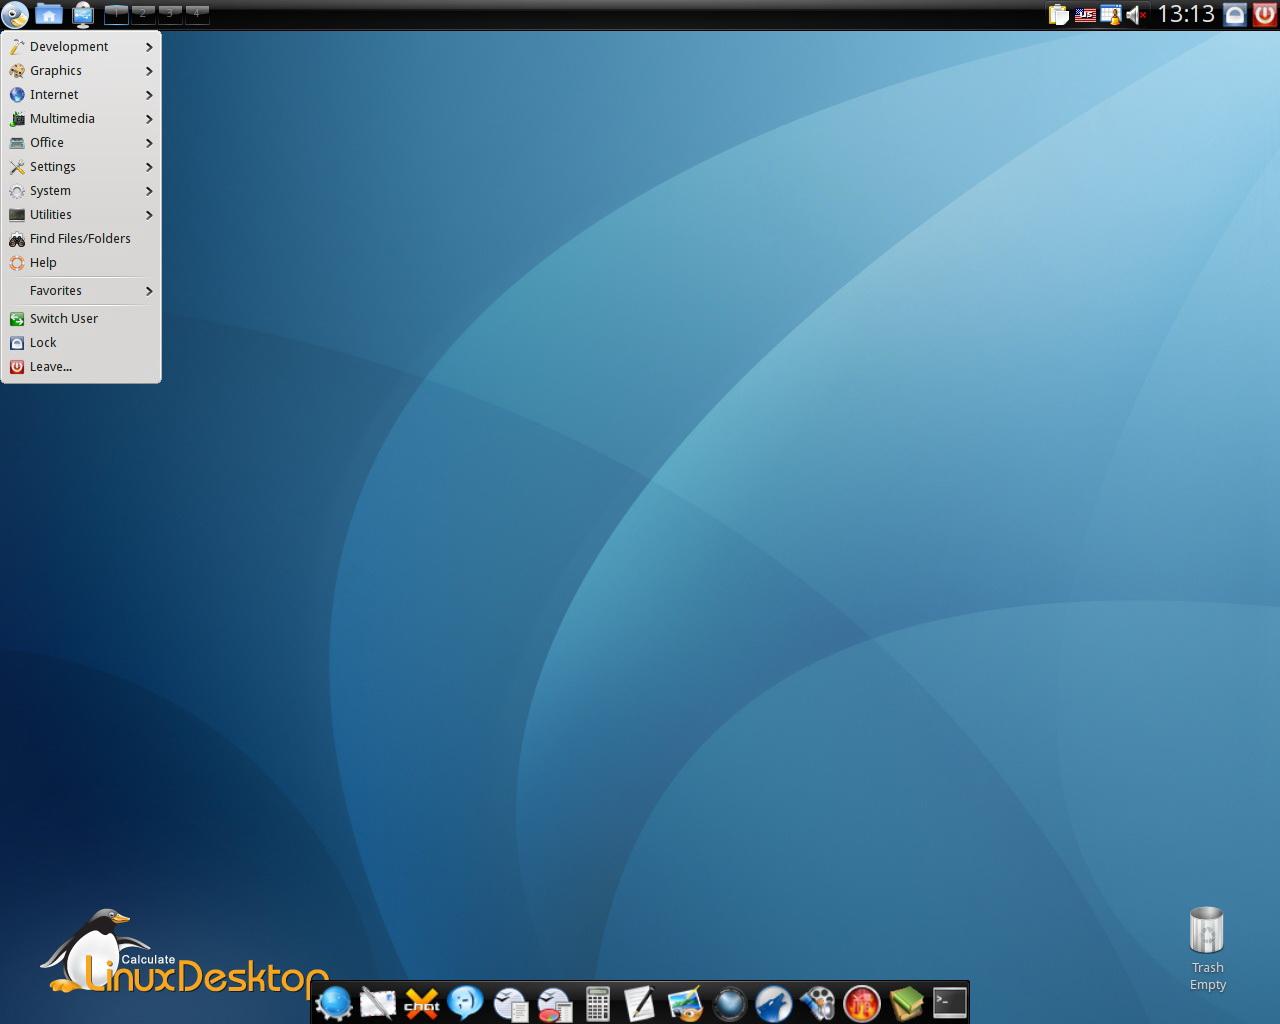 Calculate Linux Scratch Server截图1